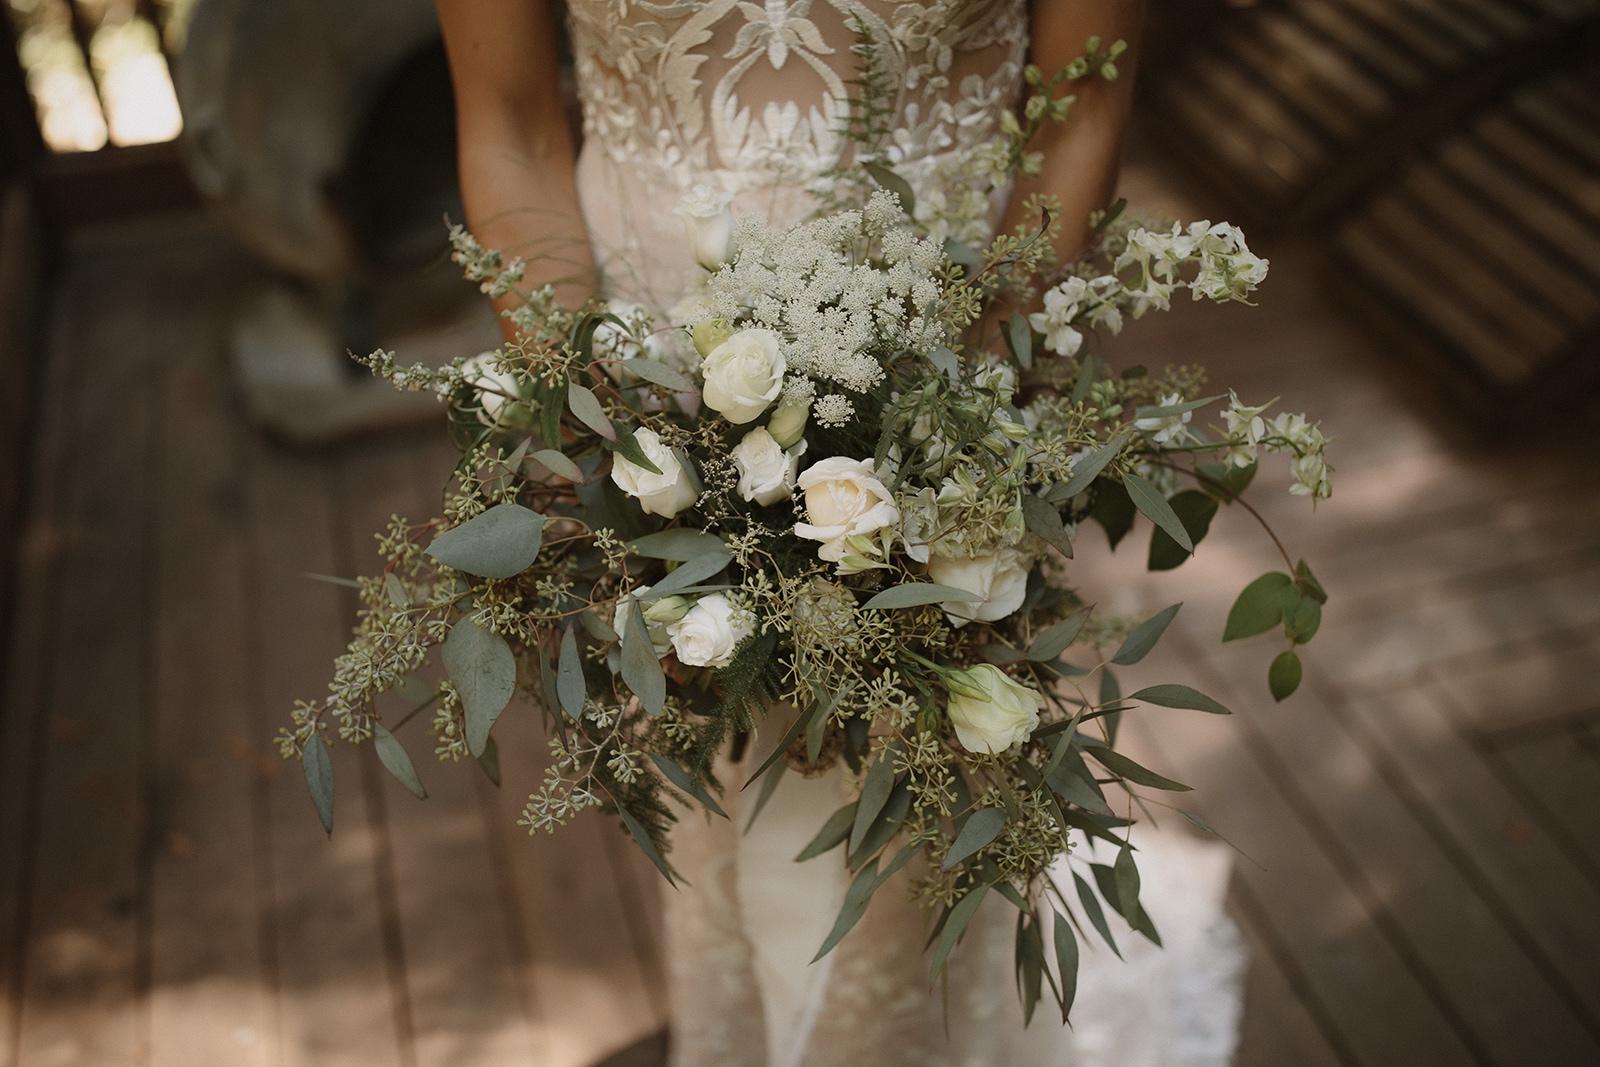 MODERN WHITES AND GREENS FOR AFOREST WEDDING - Photography by Josh Kane https://joshuakanephotography.pic-time.com/portfolio @Joshua_kane_photography